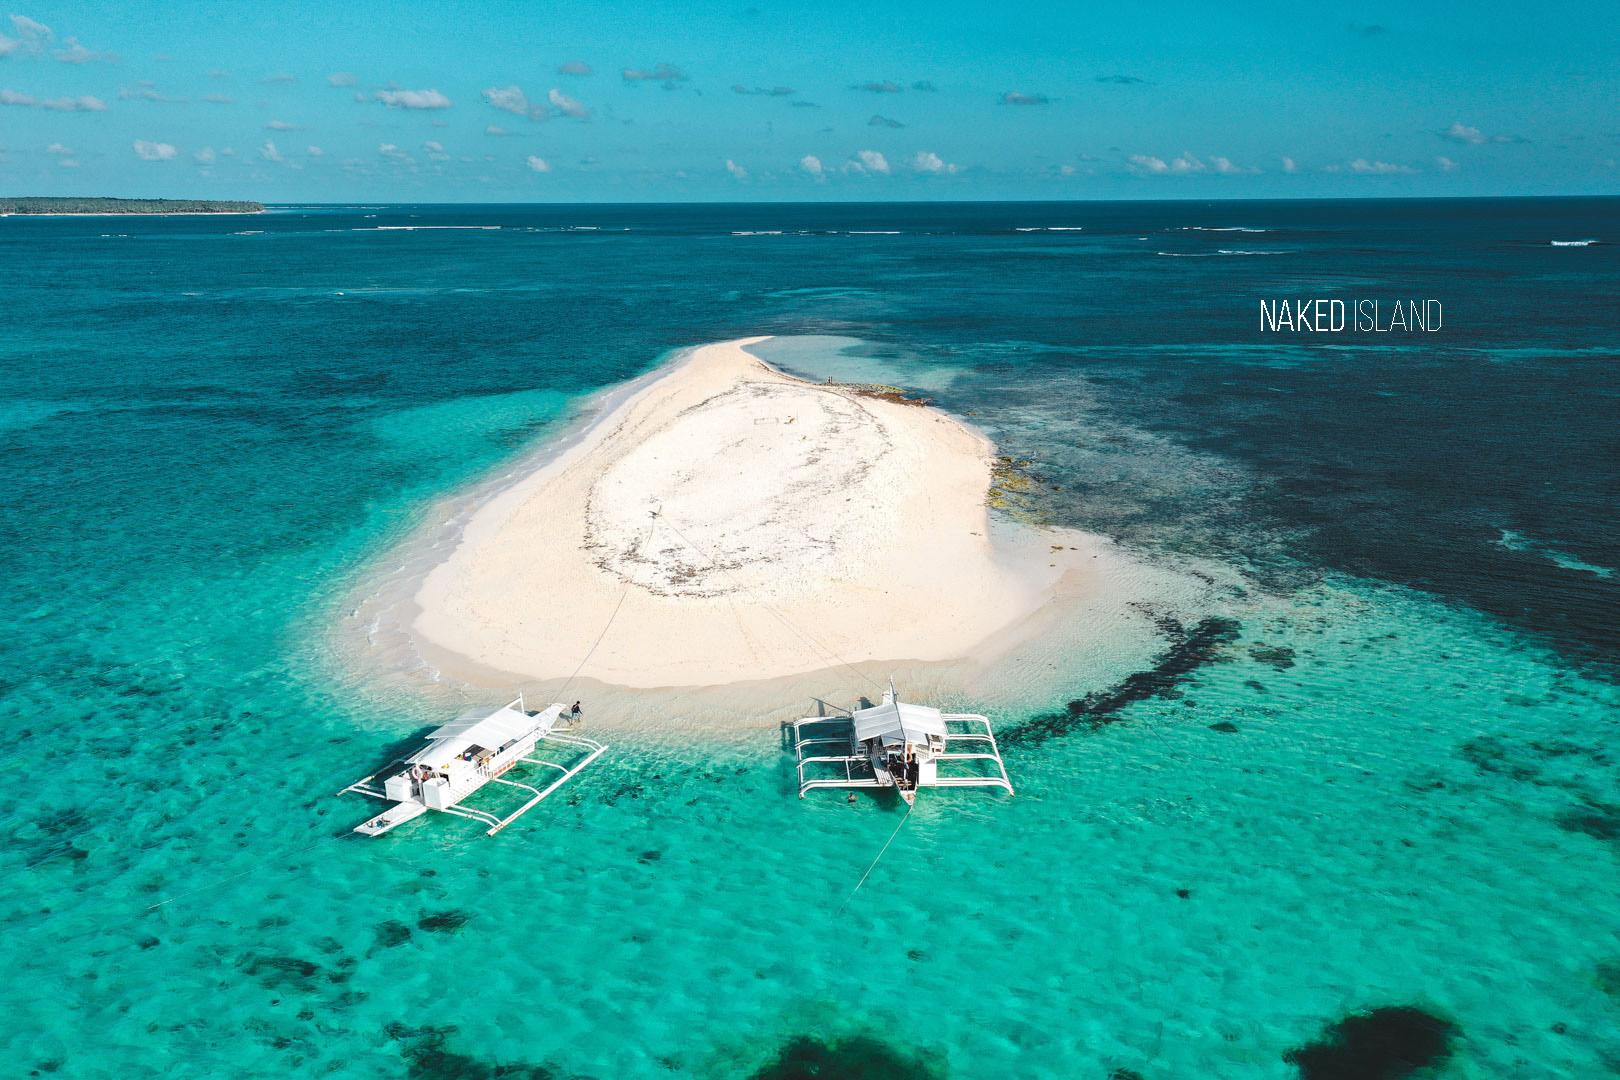 Naked Island Siargao Island Philippines #marajaw karajaw #